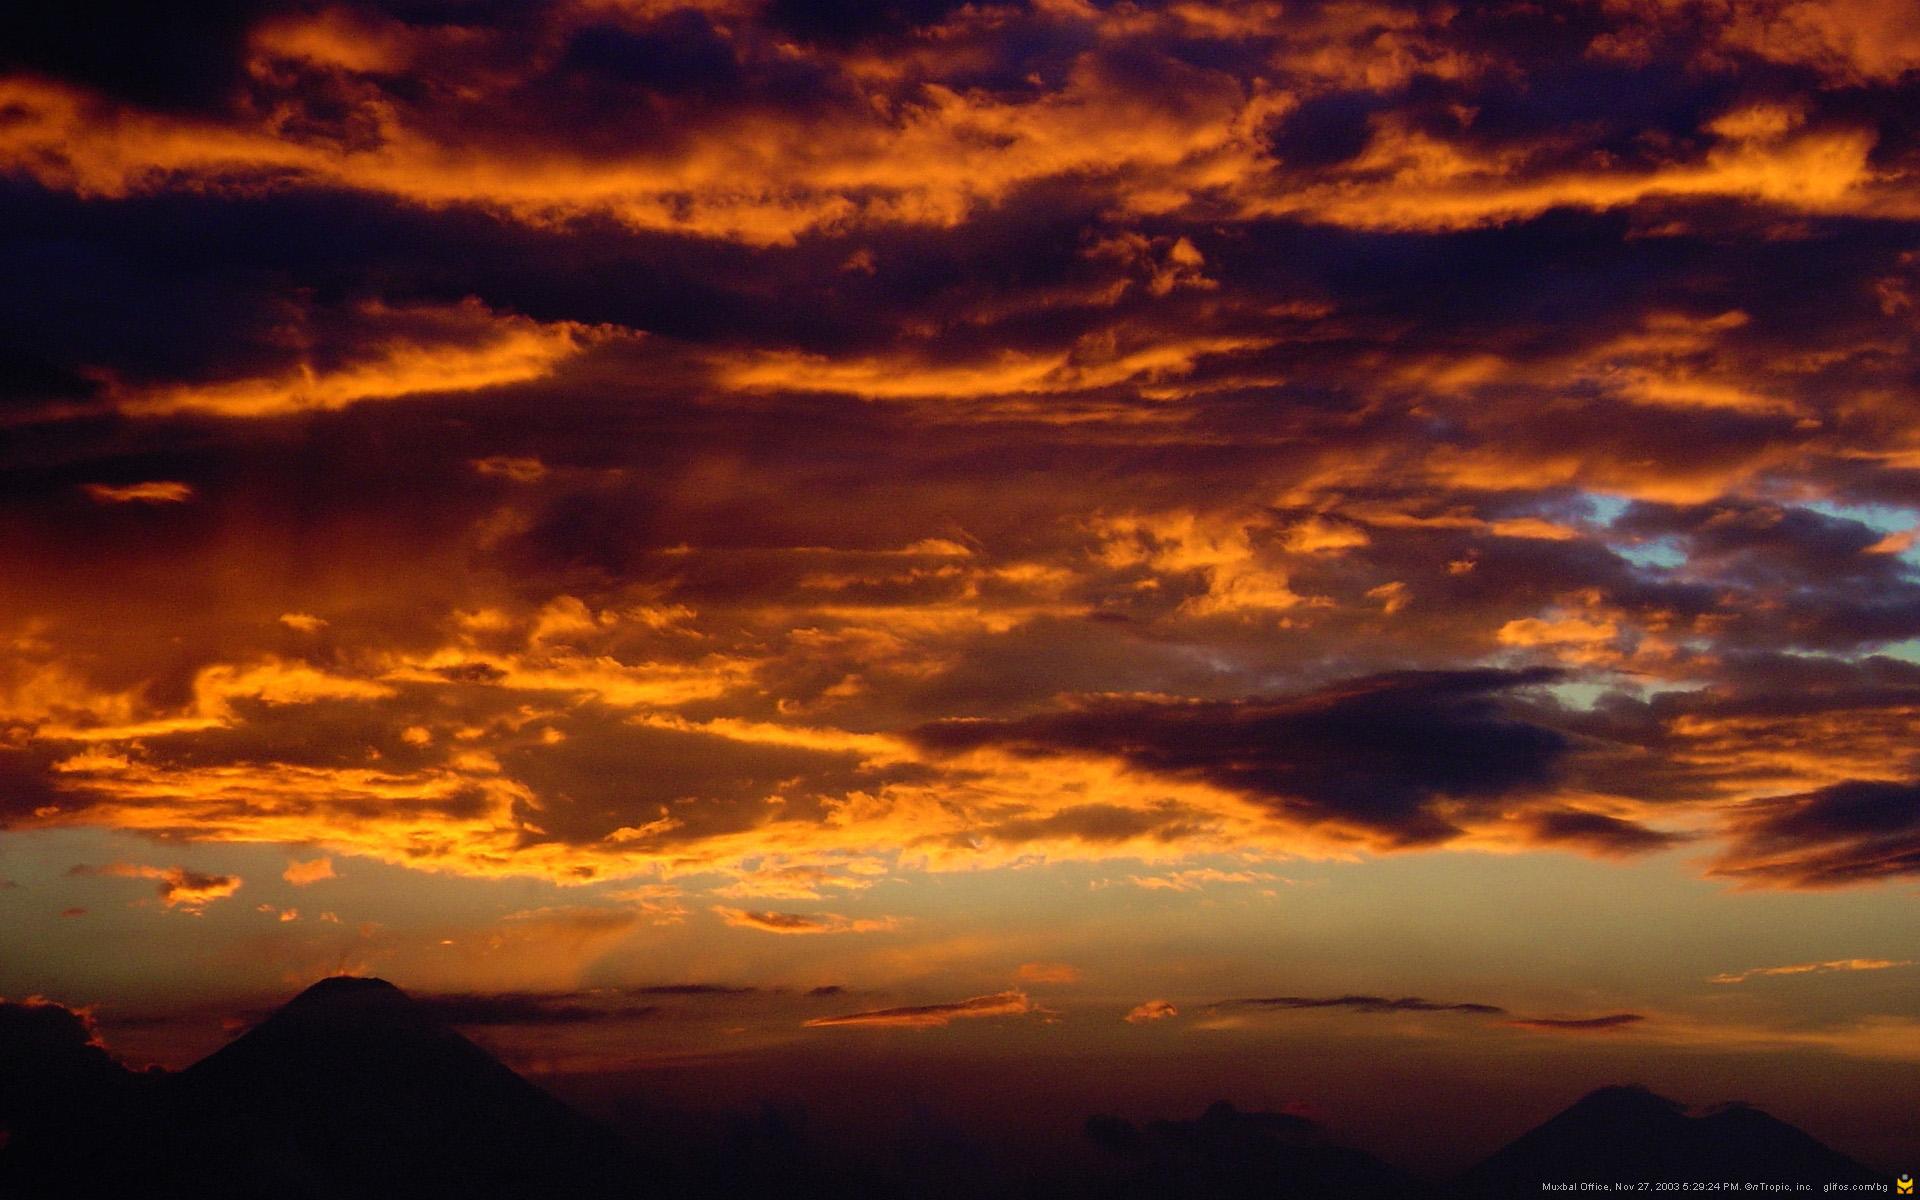 Sunset Desktop Backgrounds and Wallpaper   atardecer1920x1200   Always 1920x1200